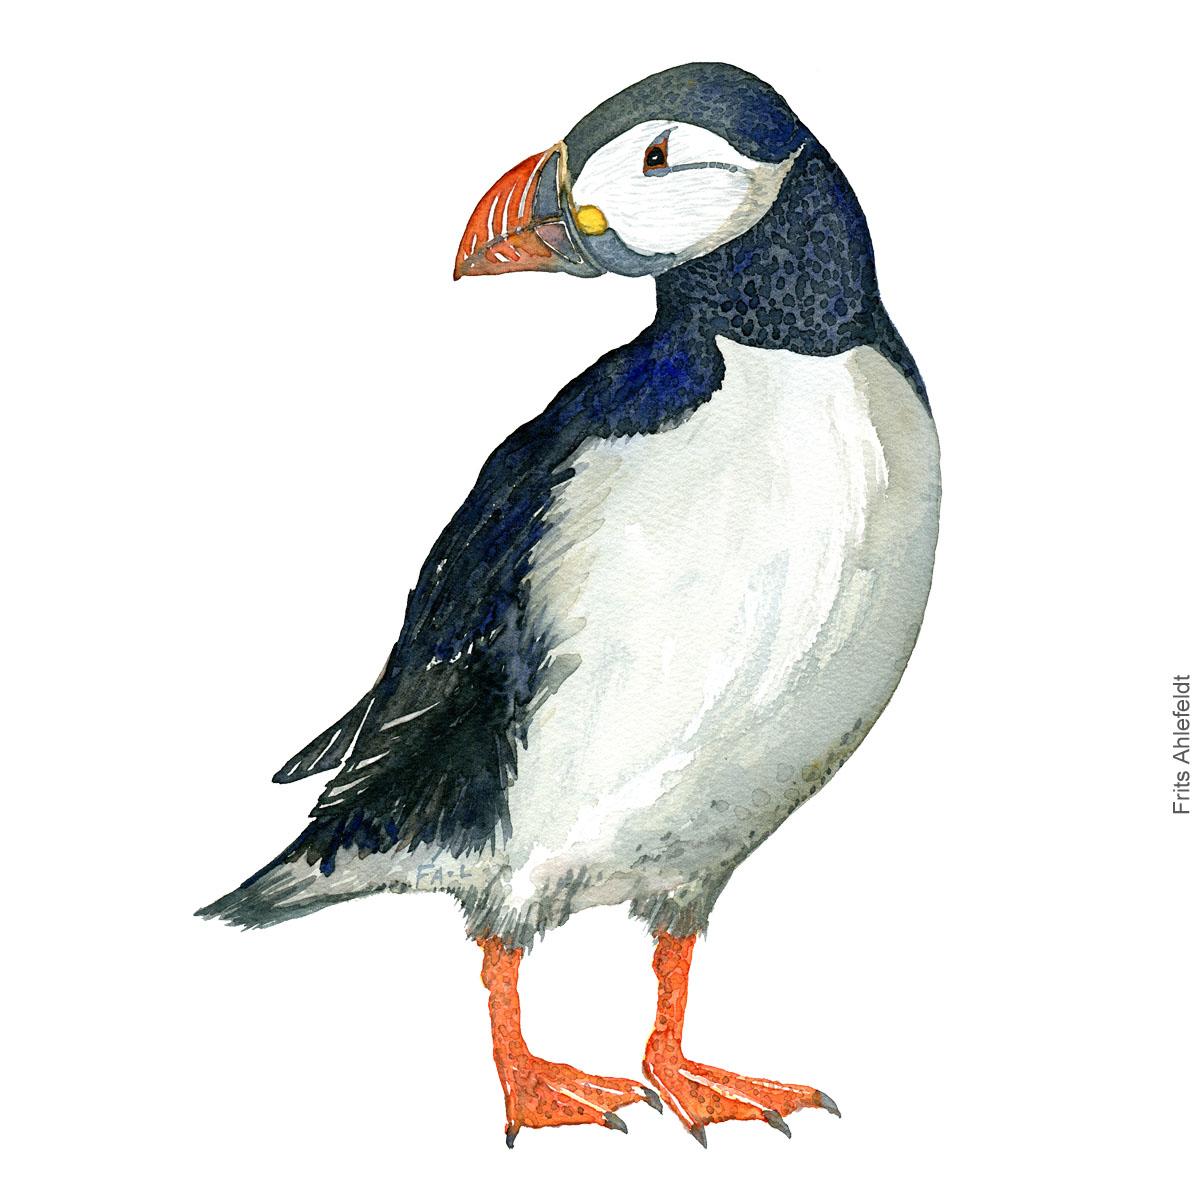 Lunde - Atlantic puffin ( Fratercula arctica ) - Bird watercolor painting. Artwork by Frits Ahlefeldt. Fugle akvarel